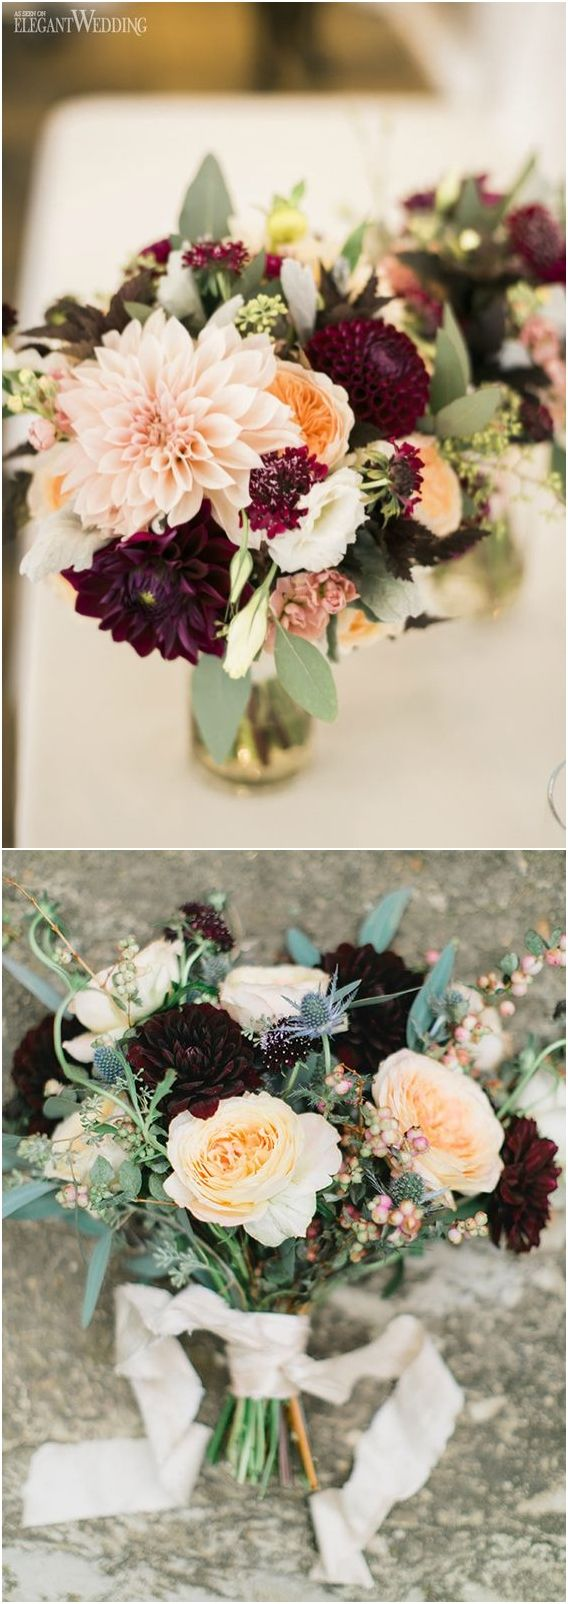 best wedding ideas images on pinterest intimate weddings